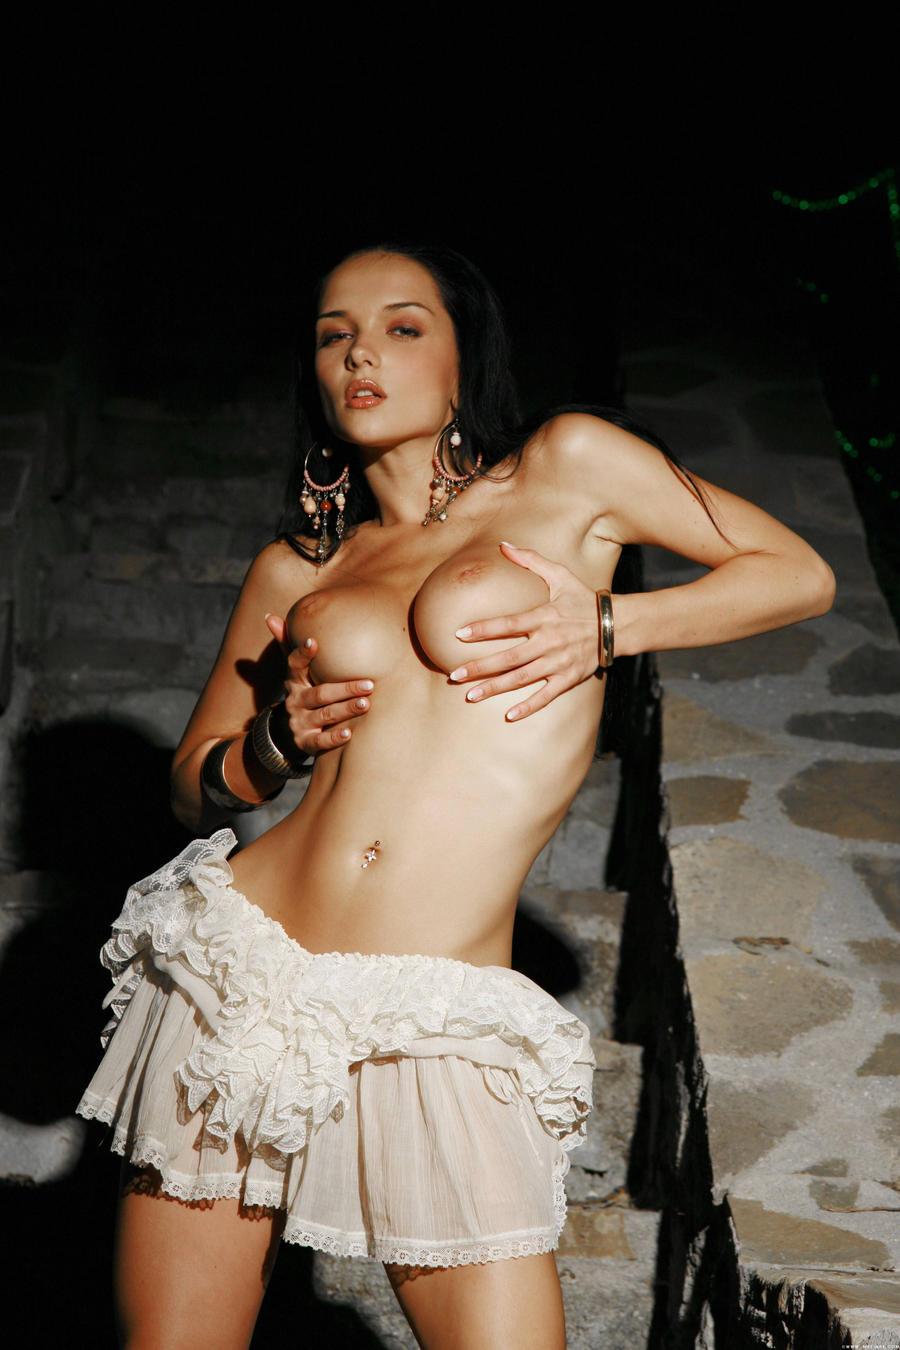 Amy smart nude picks